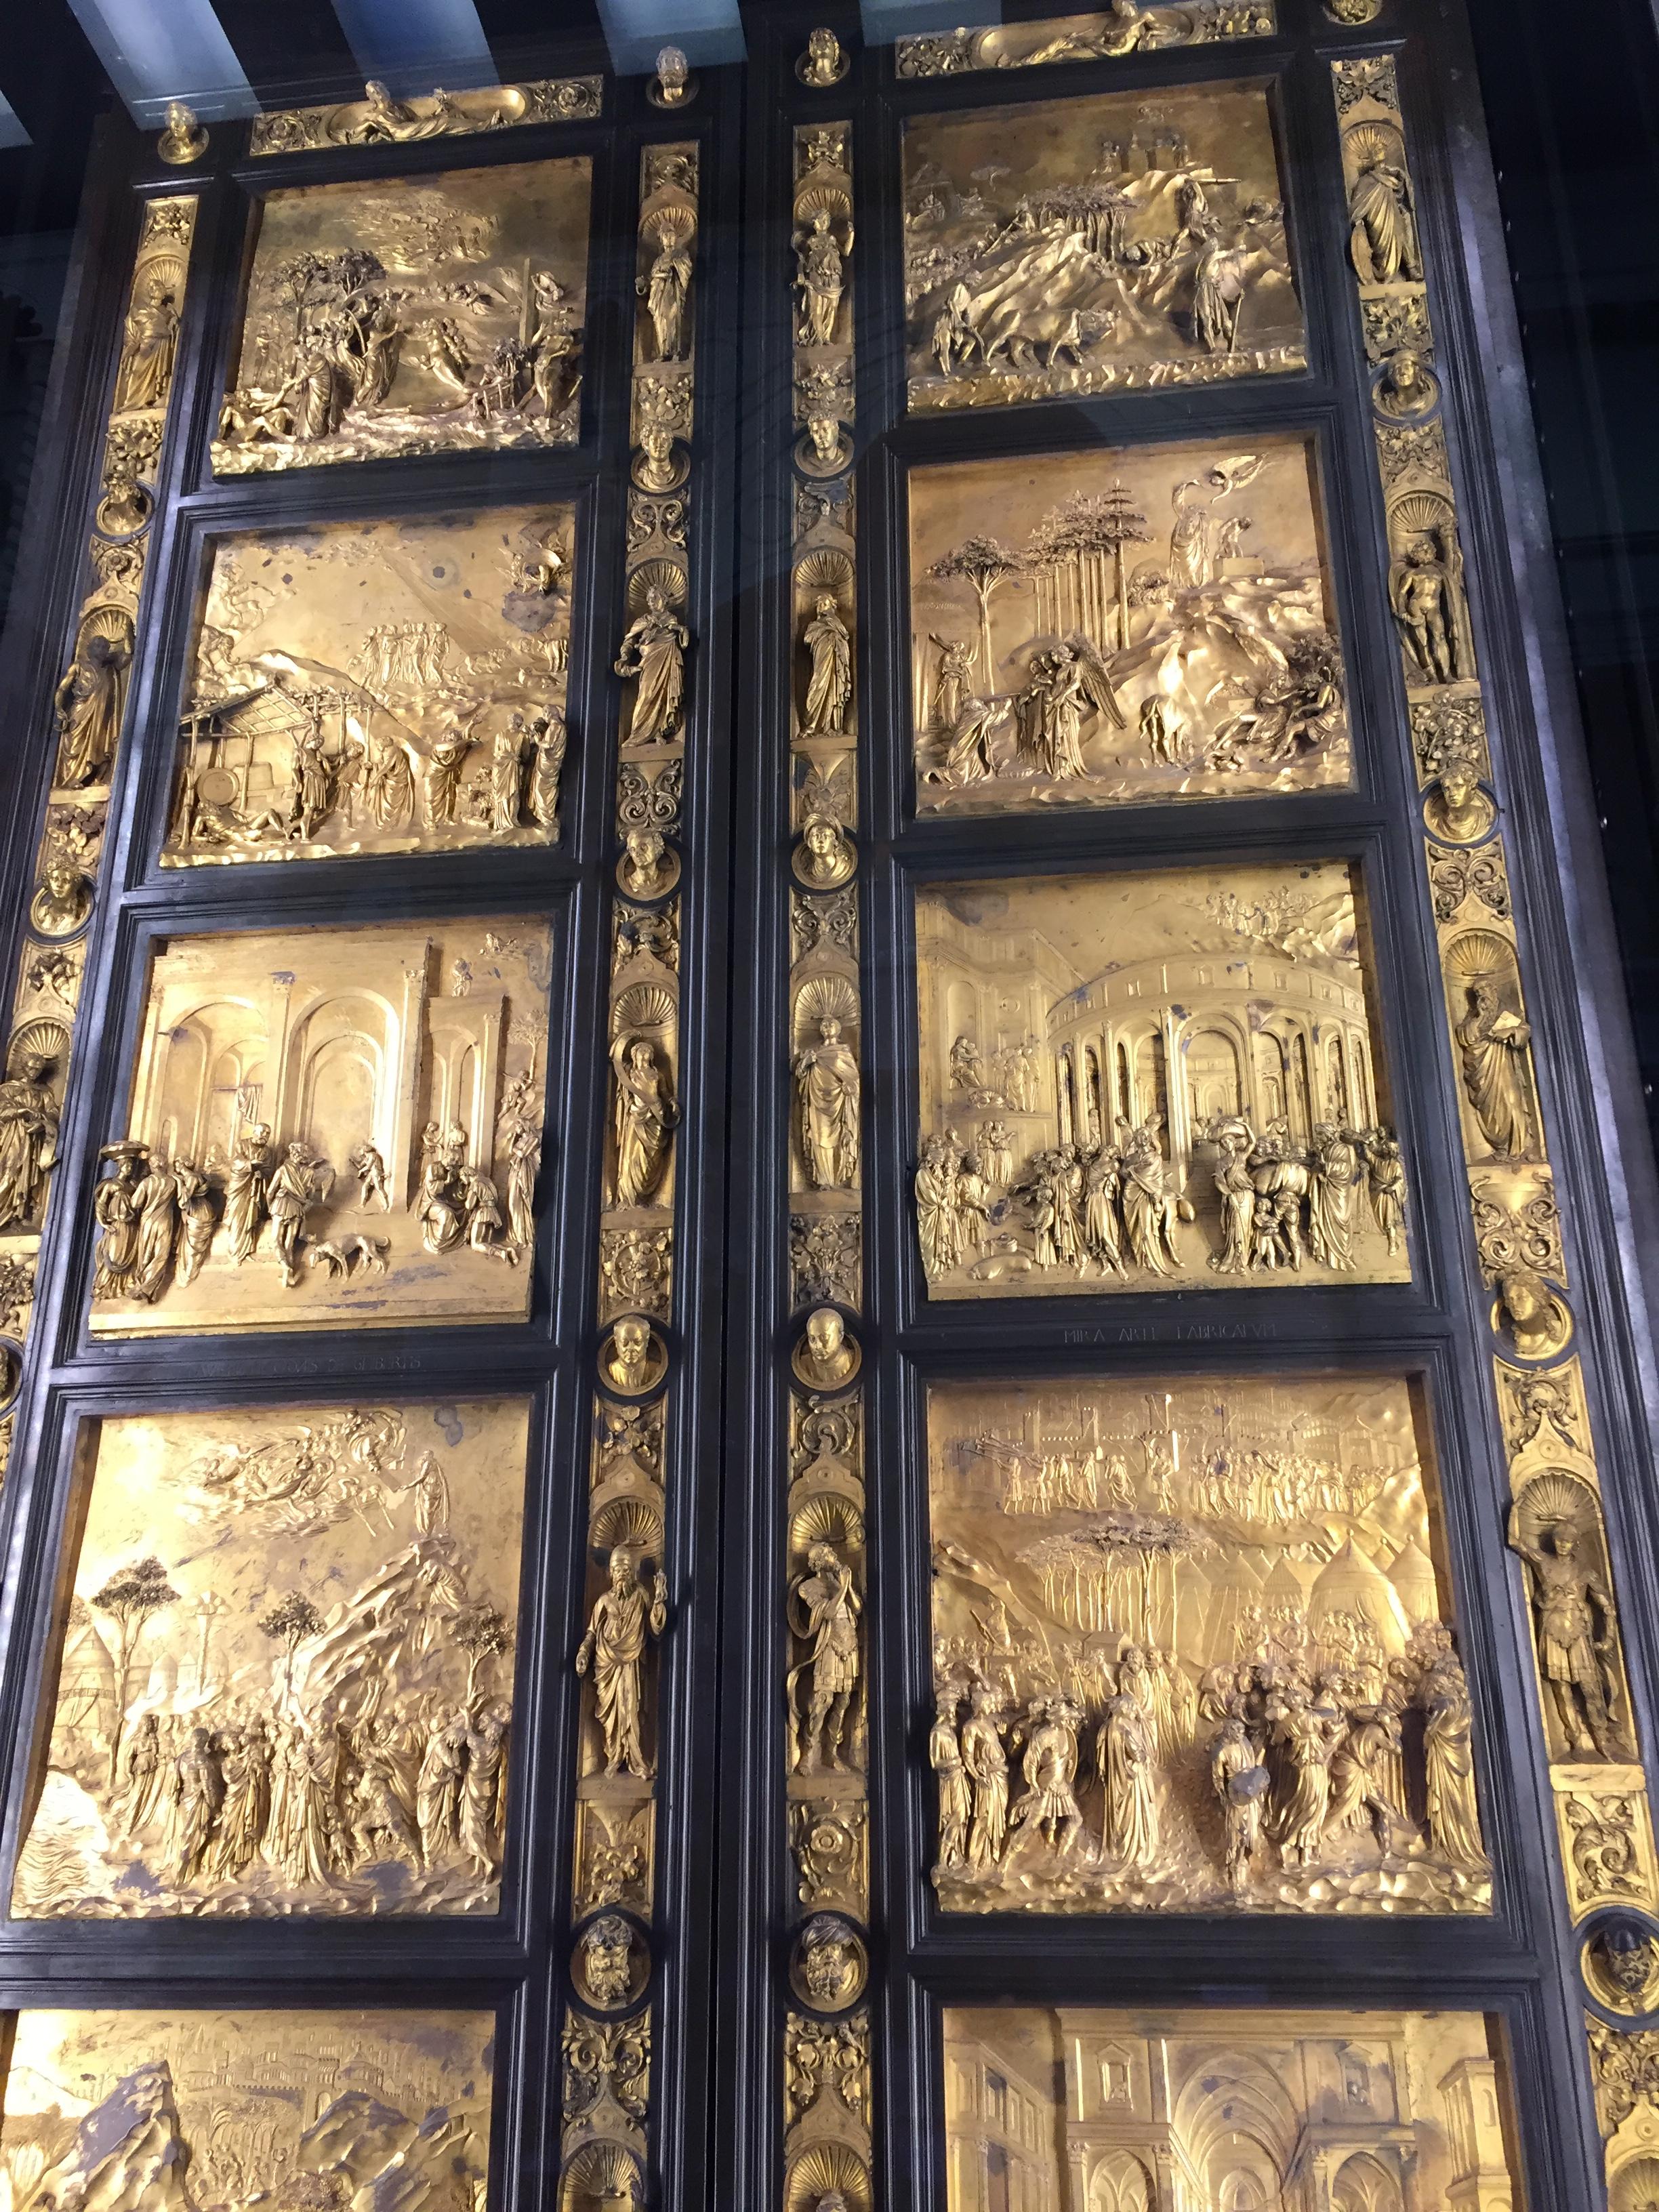 img 0841 - Visitando la Catedral Santa Maria del Fiore de Florencia I/III